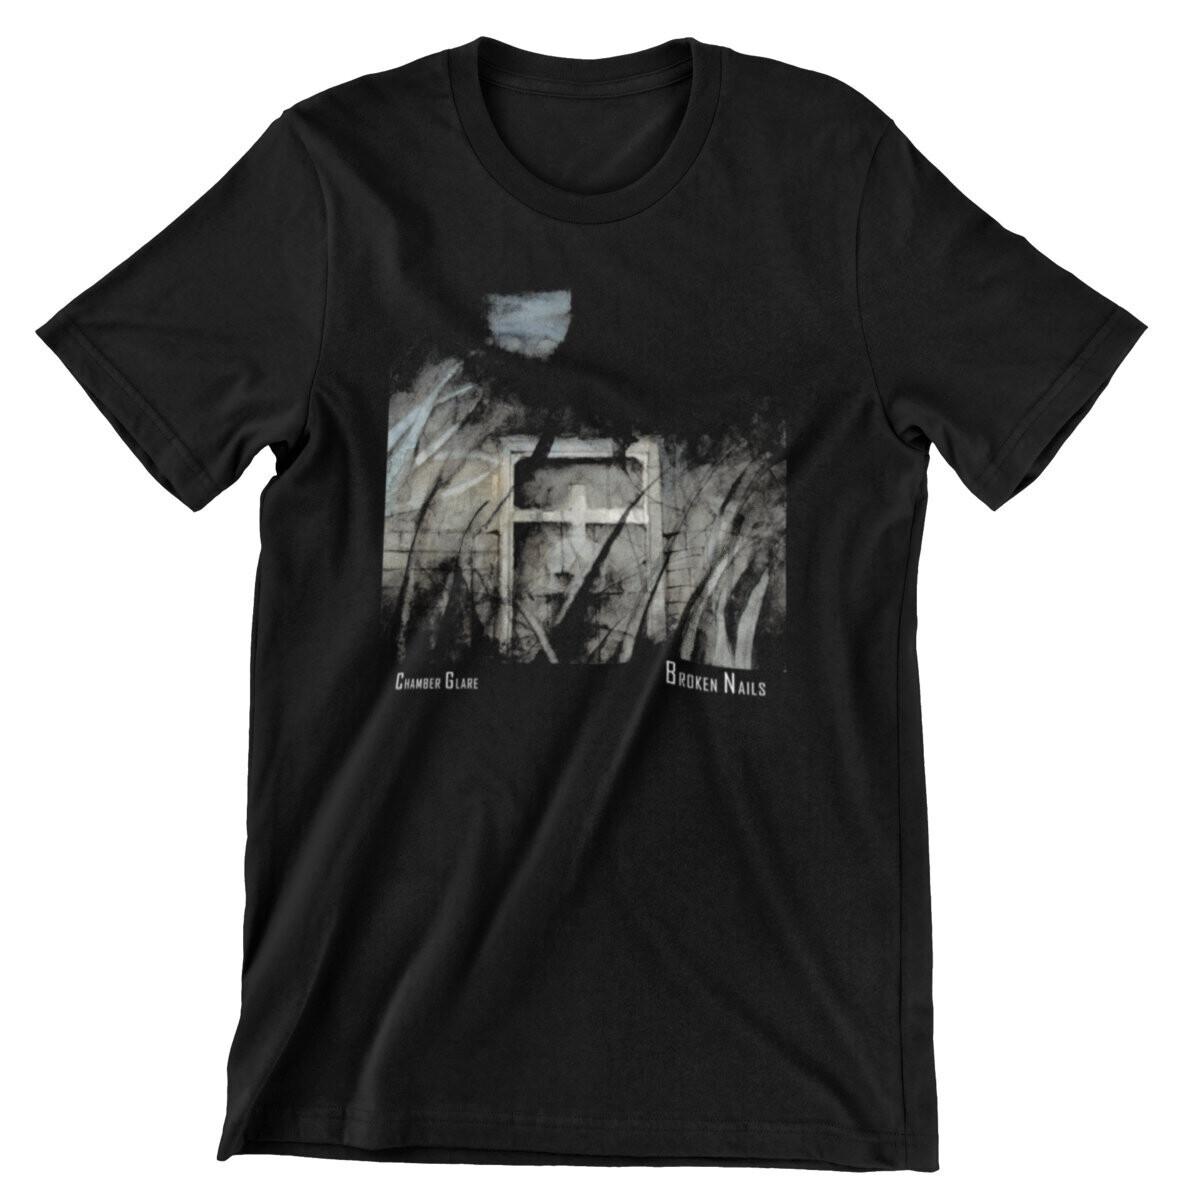 "Broken NAils ""Chamber Glare Cover Art"" T-Shirt"